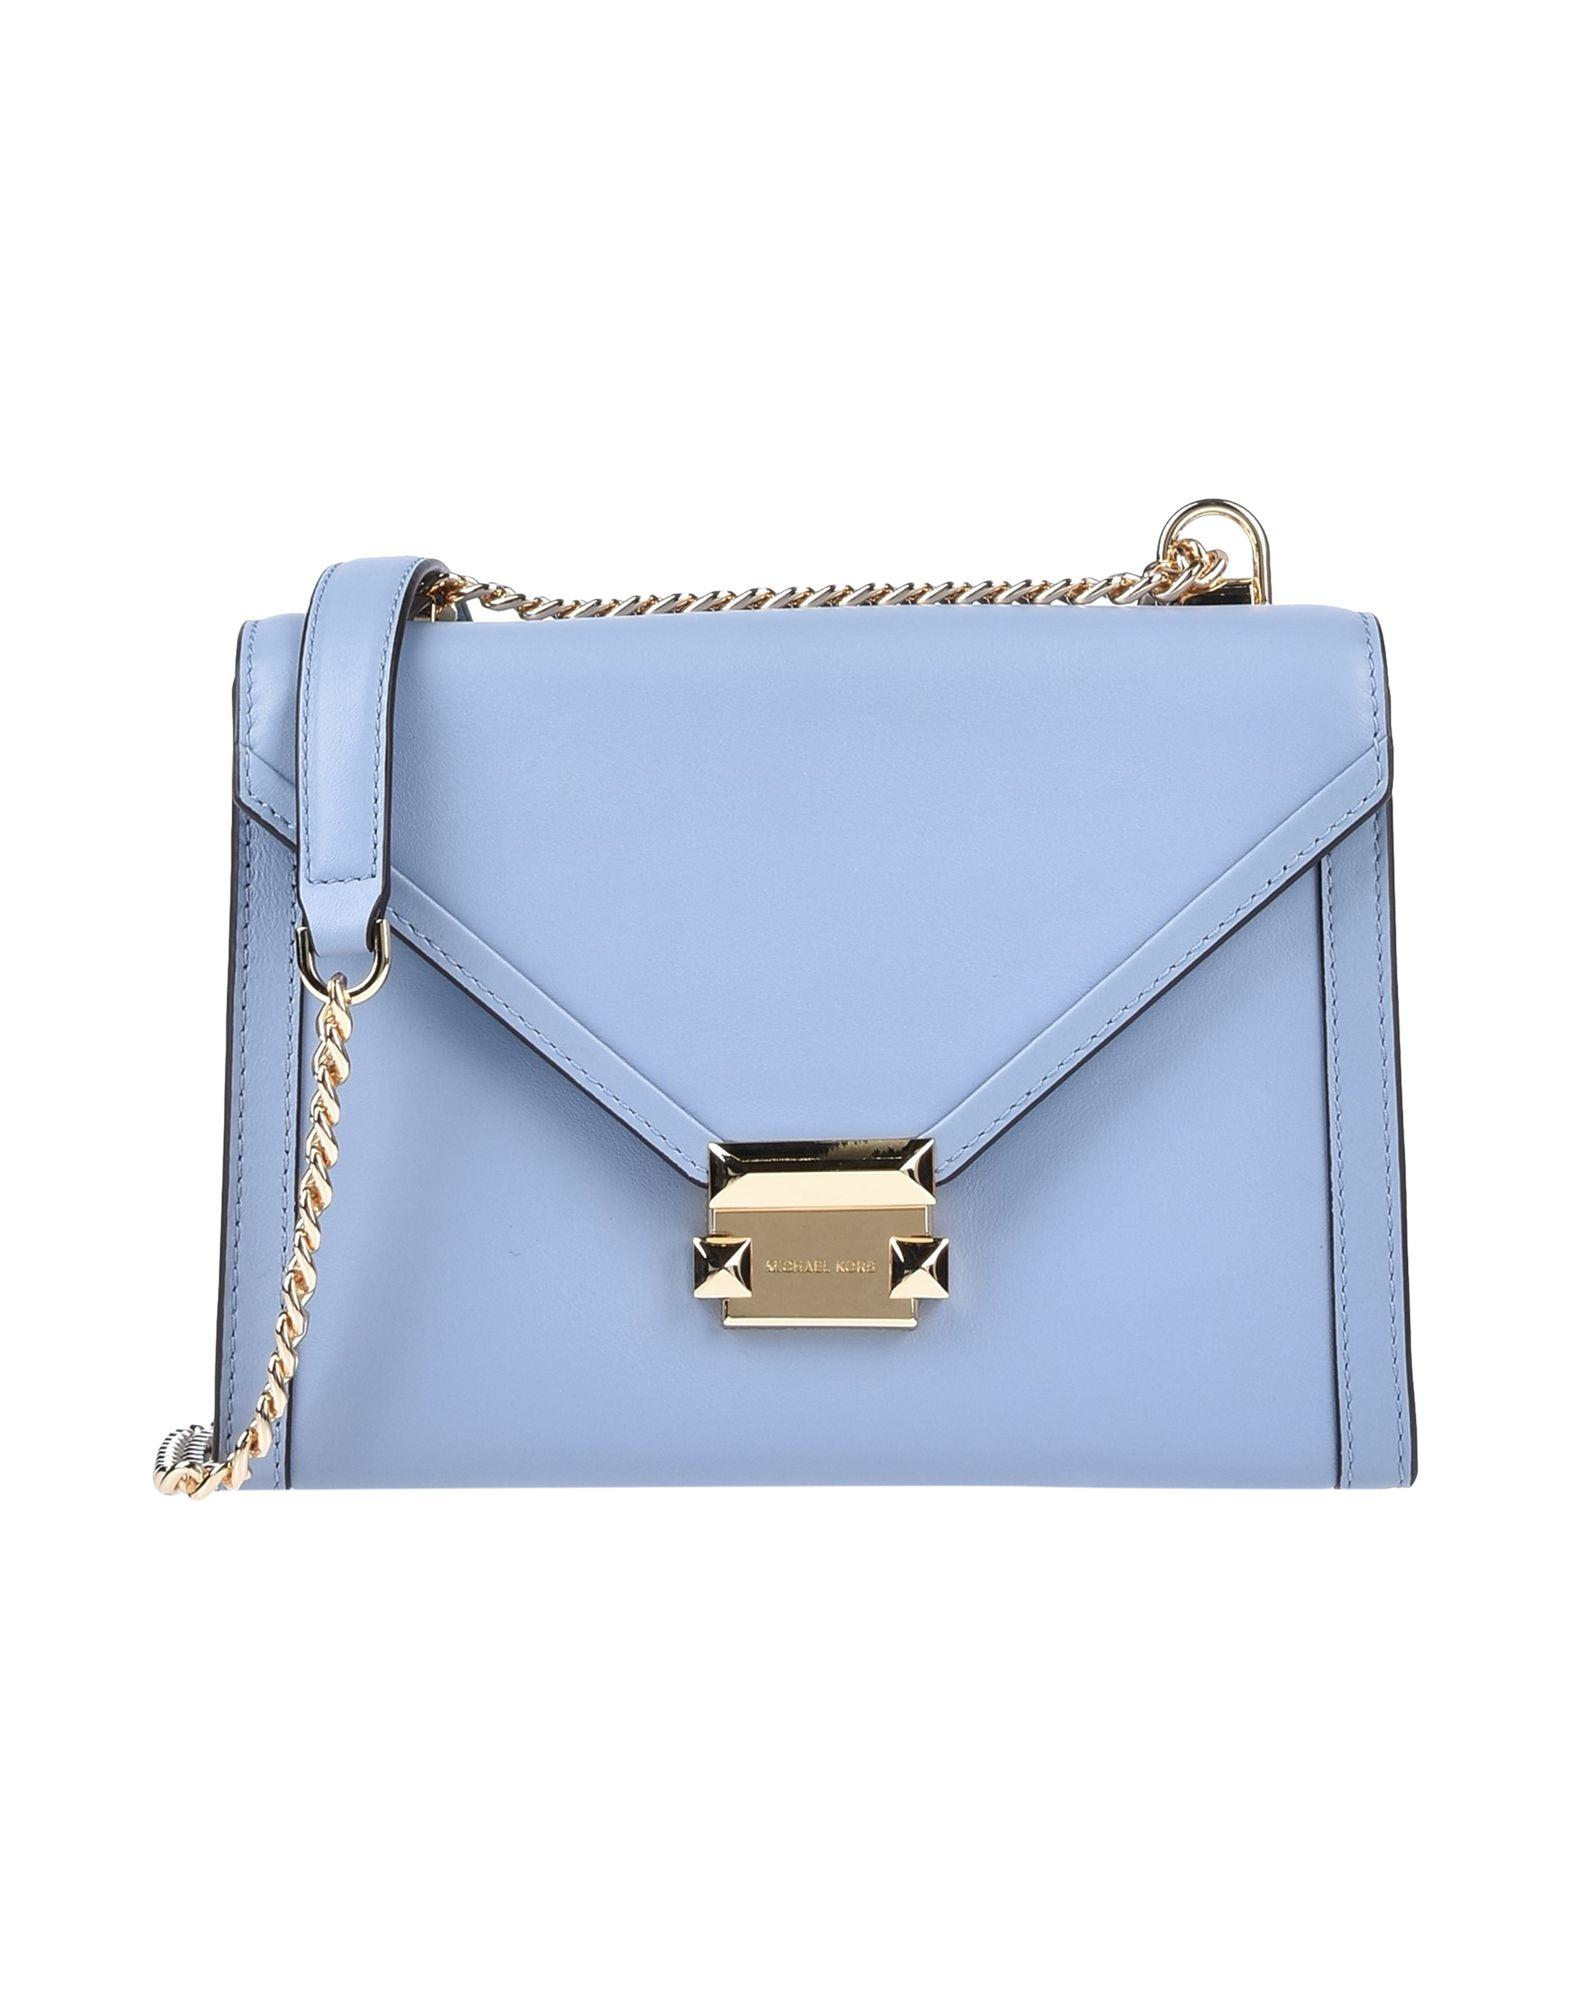 d9626feea9b13b MICHAEL Michael Kors Cross-body Bag in Blue - Lyst